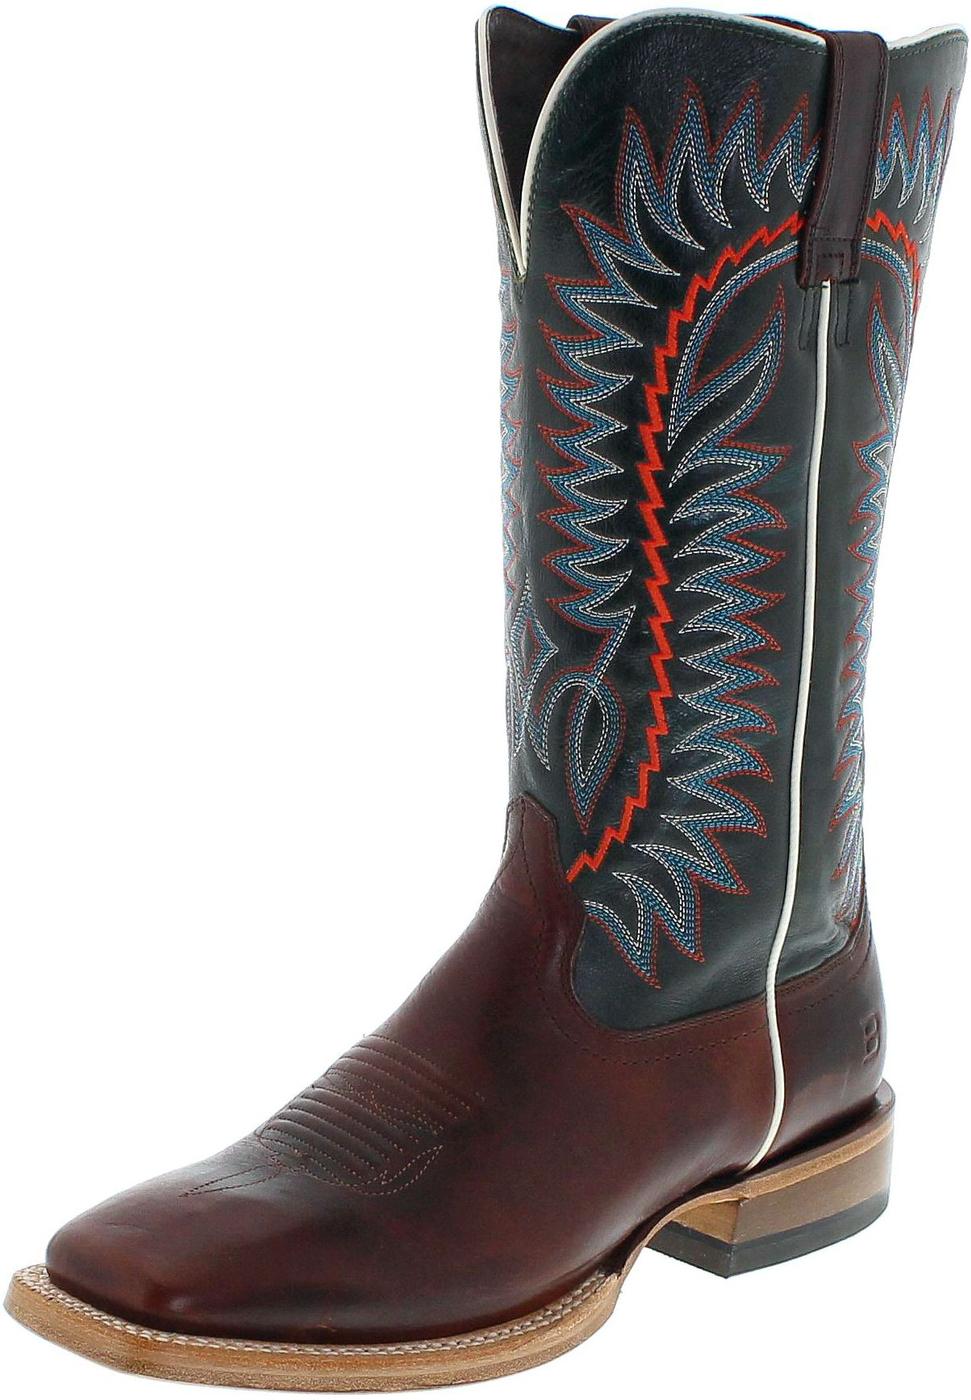 Ariat RELENTLESS ELITE 21671 Texaco Cognac Sic Em Sapphire Western riding boot - brown blue